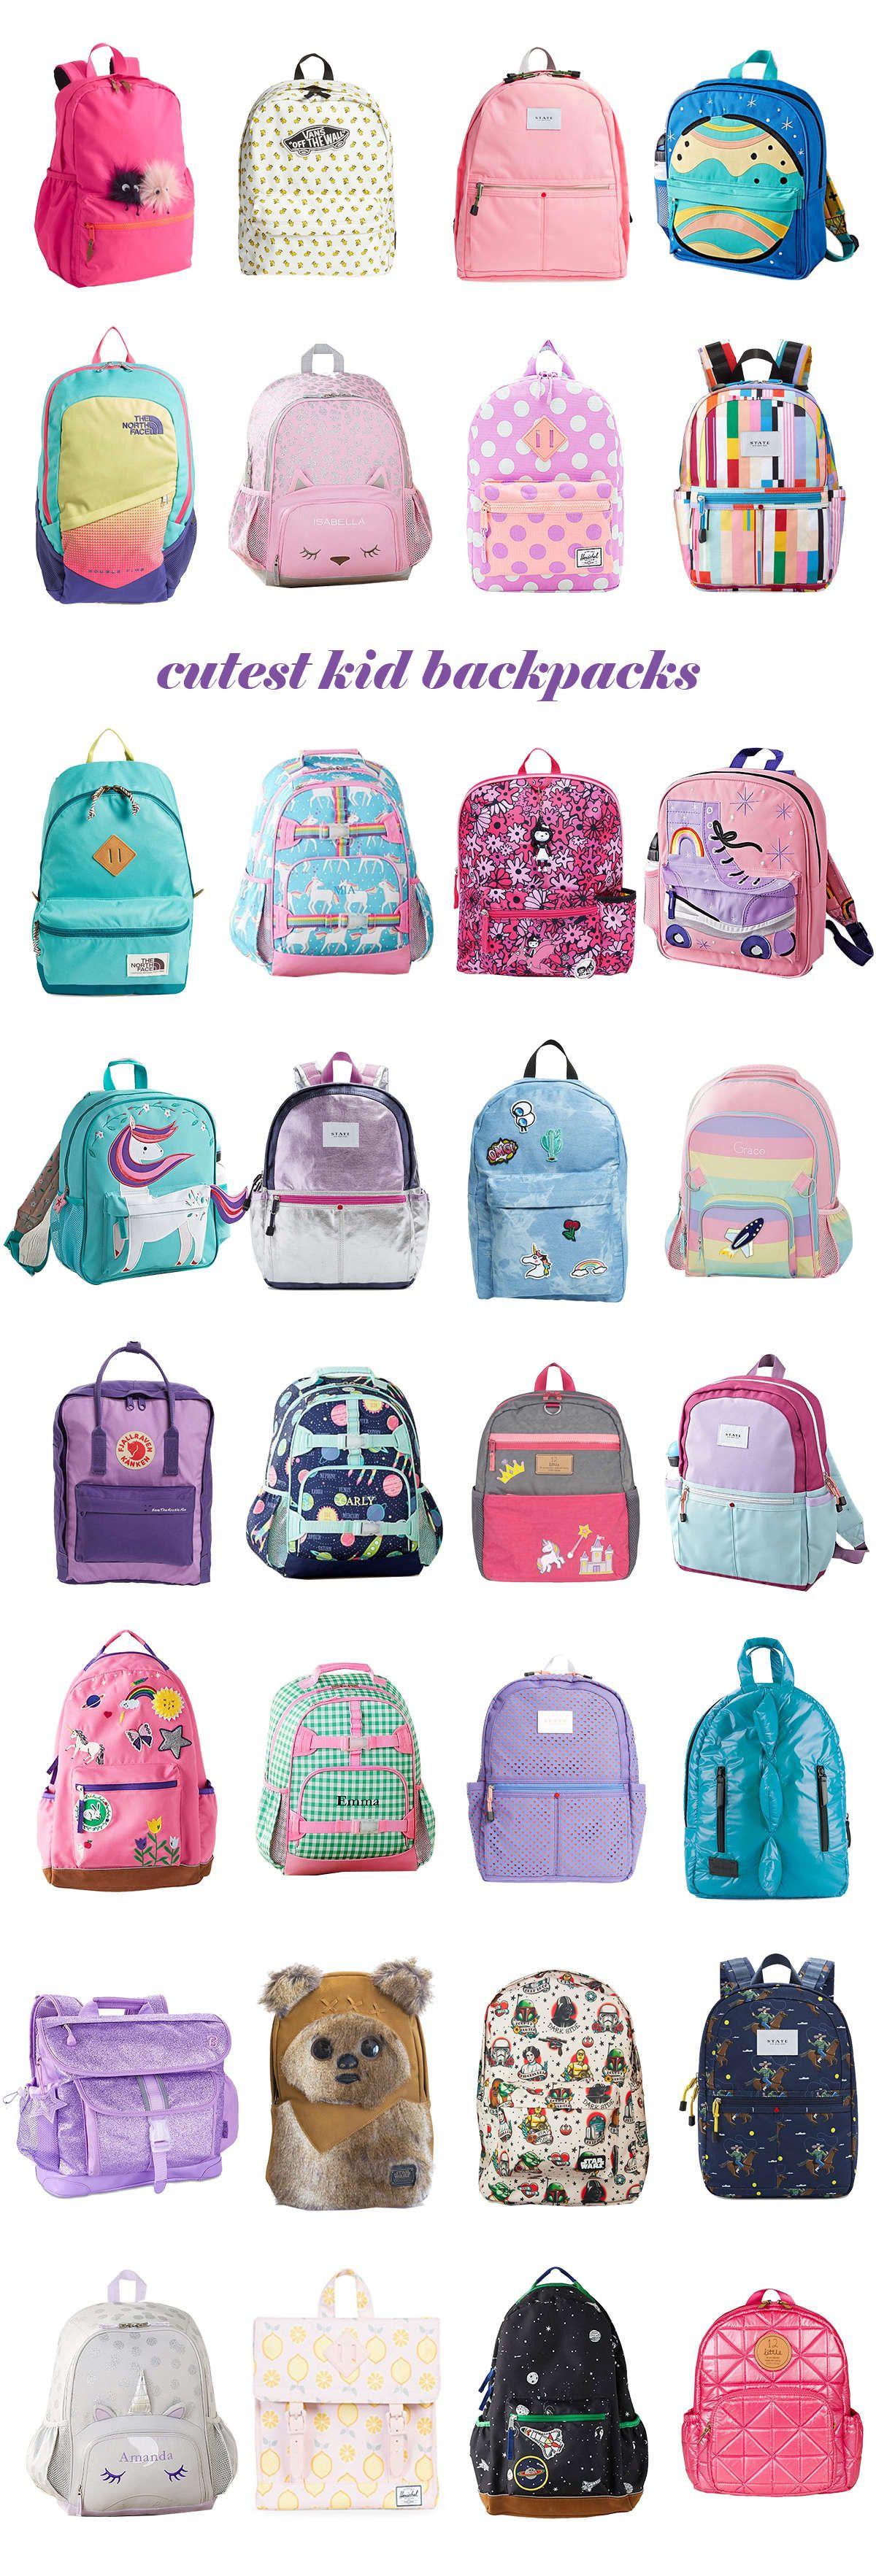 edb2294704d7 cutest kid backpacks for back to school